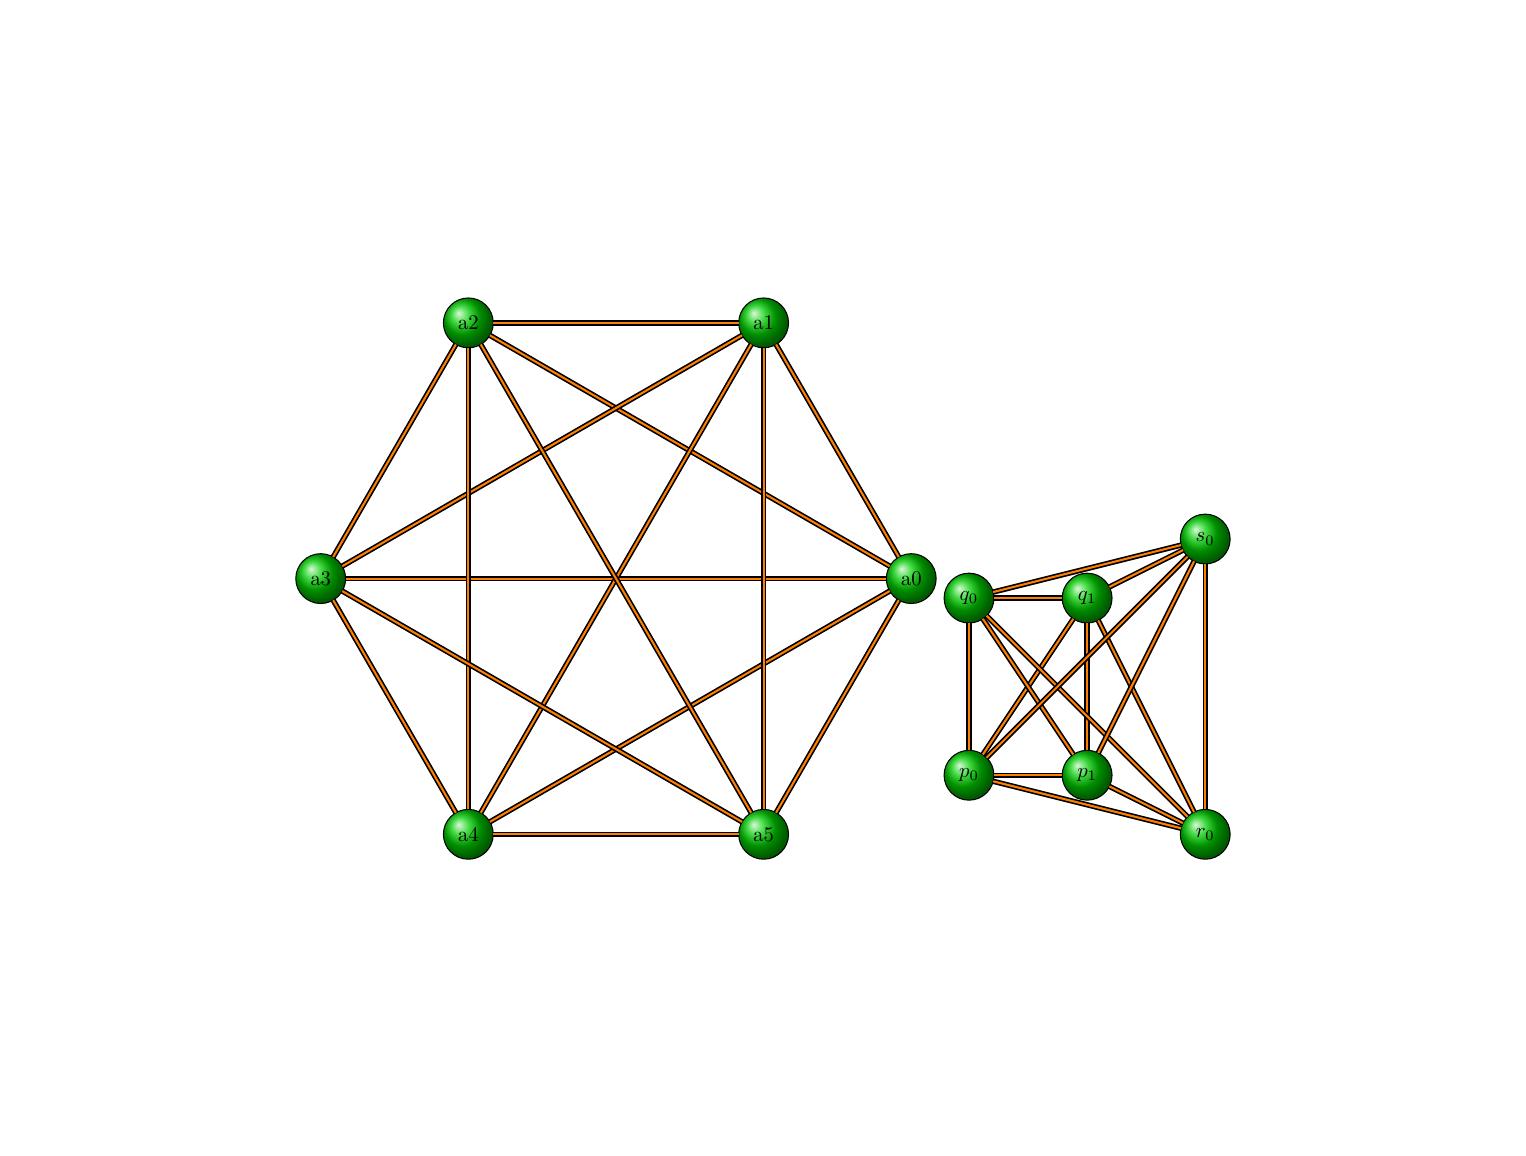 nn-08-tkz-berge-01+neuralnet+scope+foreach+pkg